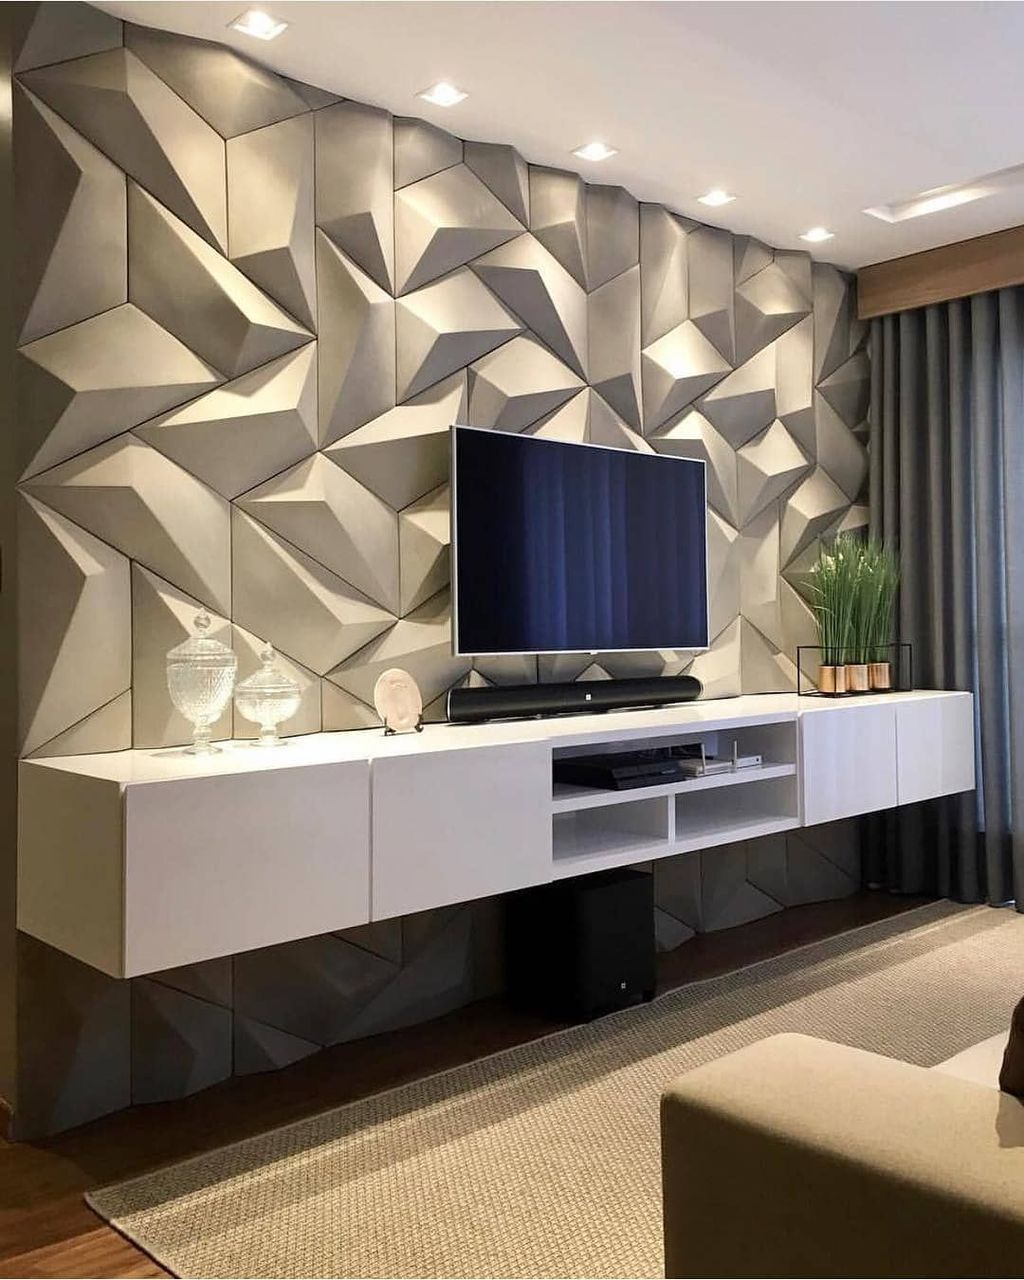 36 Lovely Tile Wall For Living Room Decorations In 2020 Li